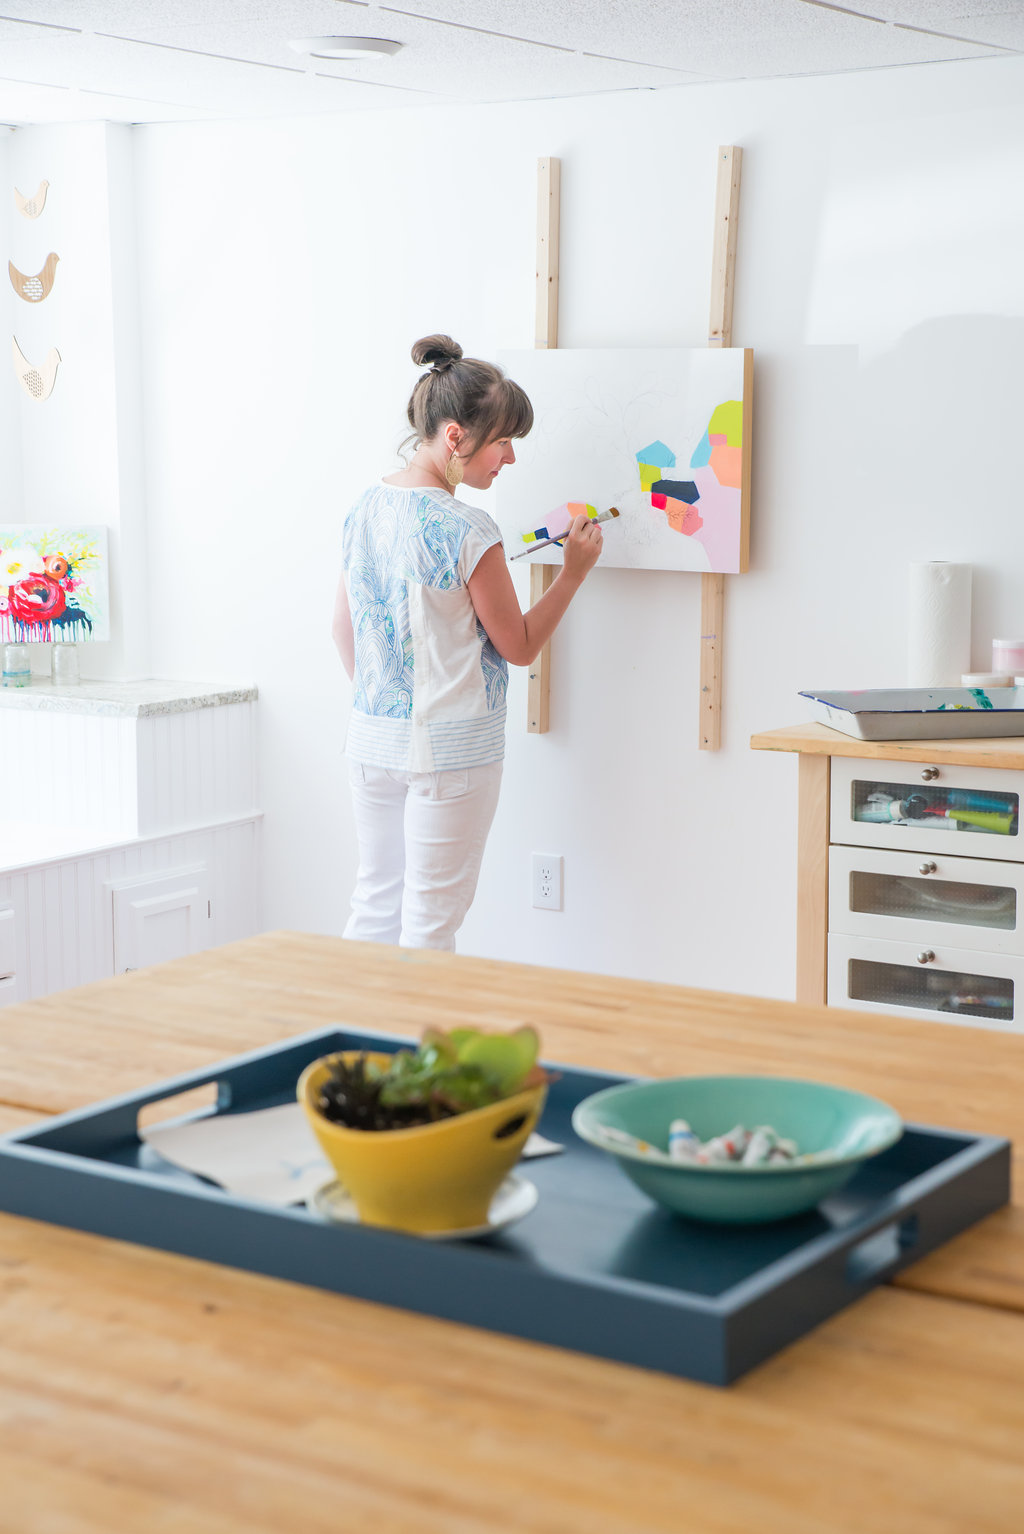 Megan Carty painting in her studio